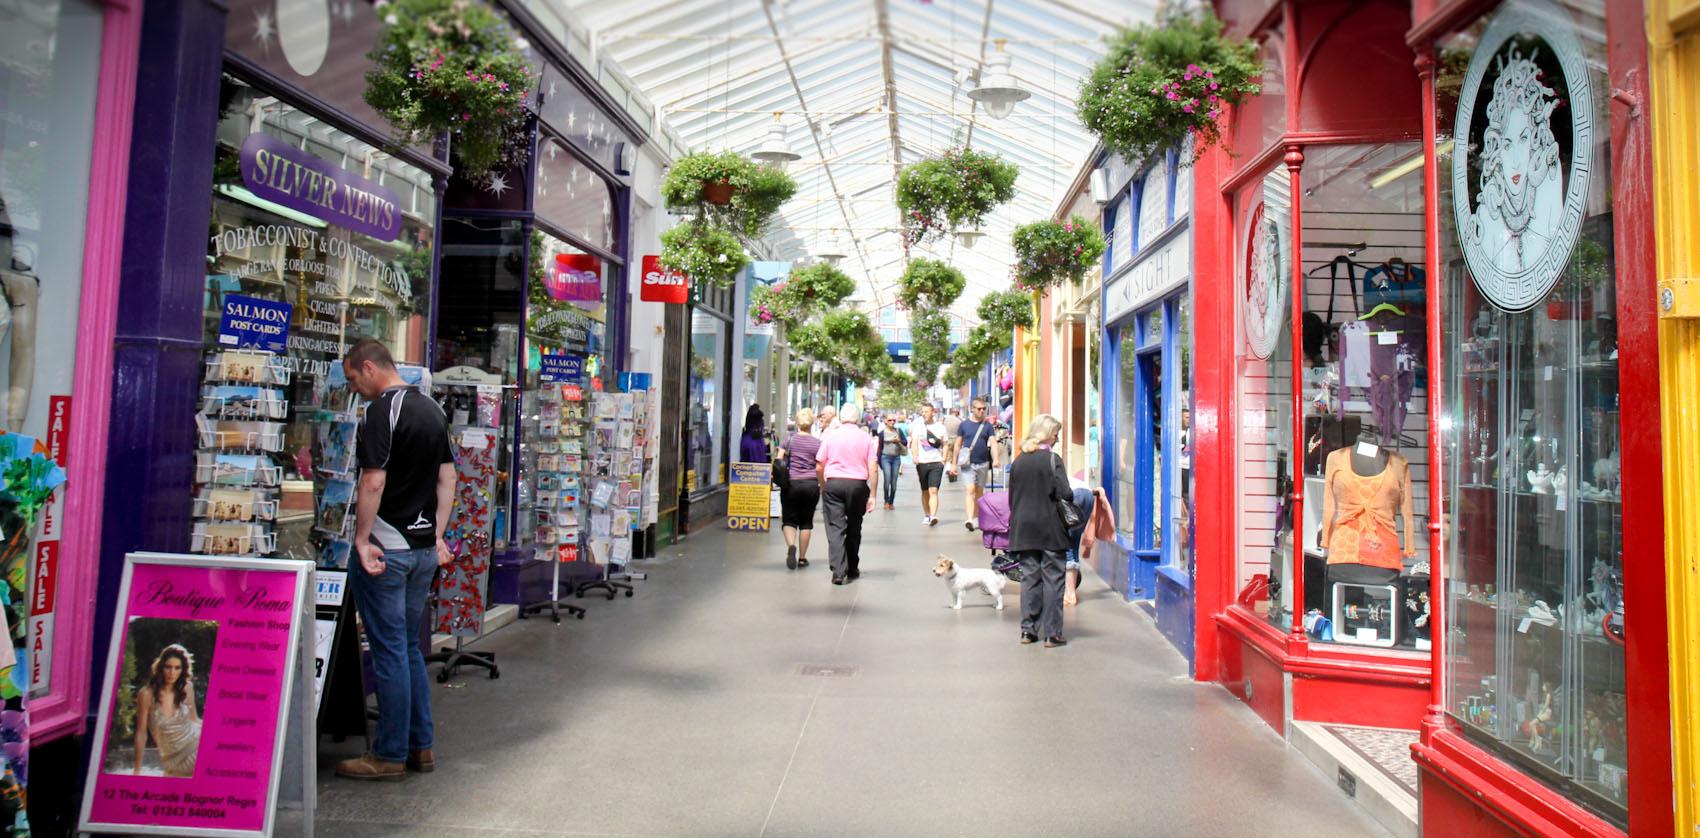 Bognor Regis Shopping Arcade